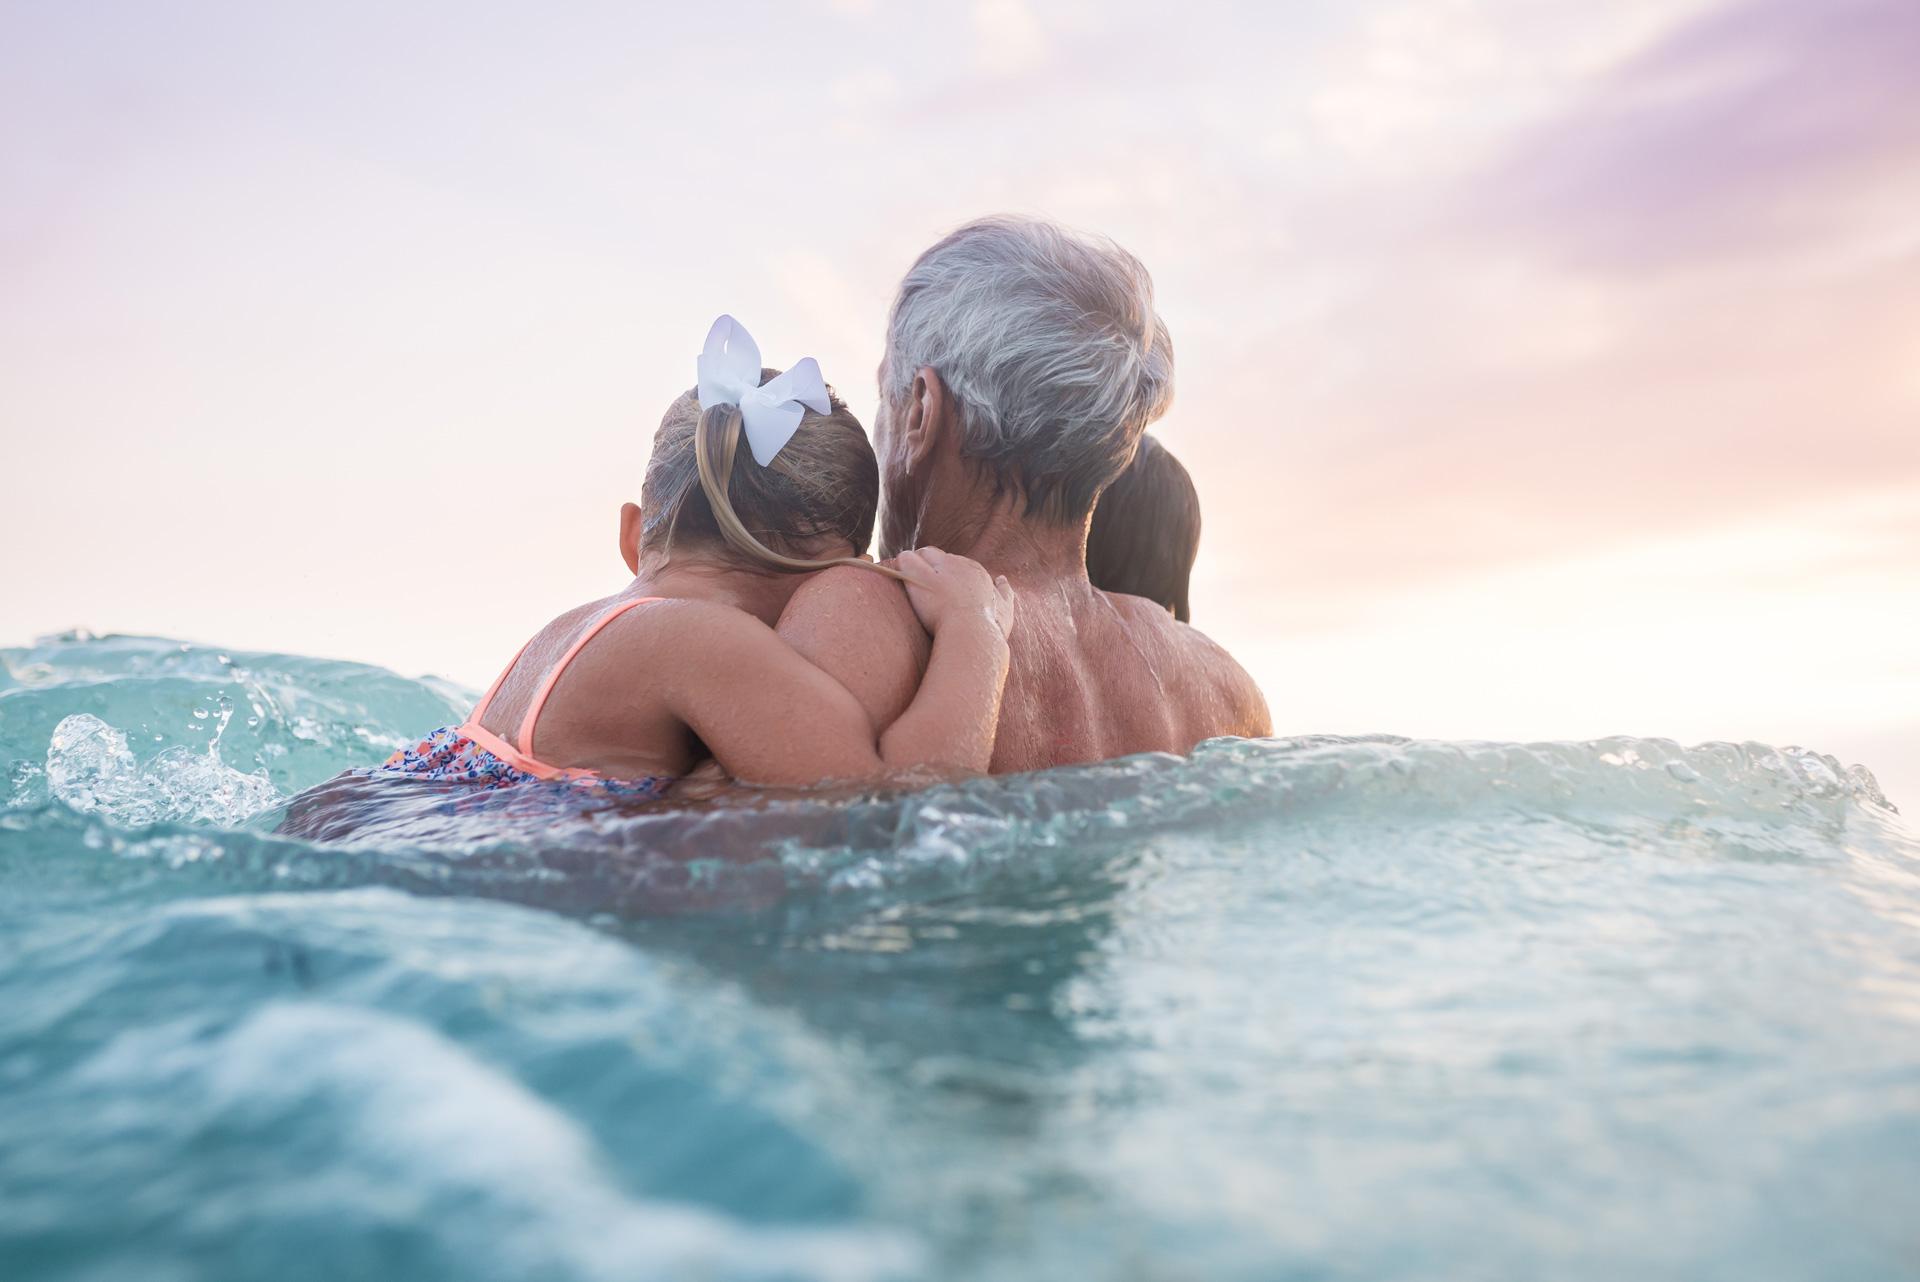 Grandpa with children in water